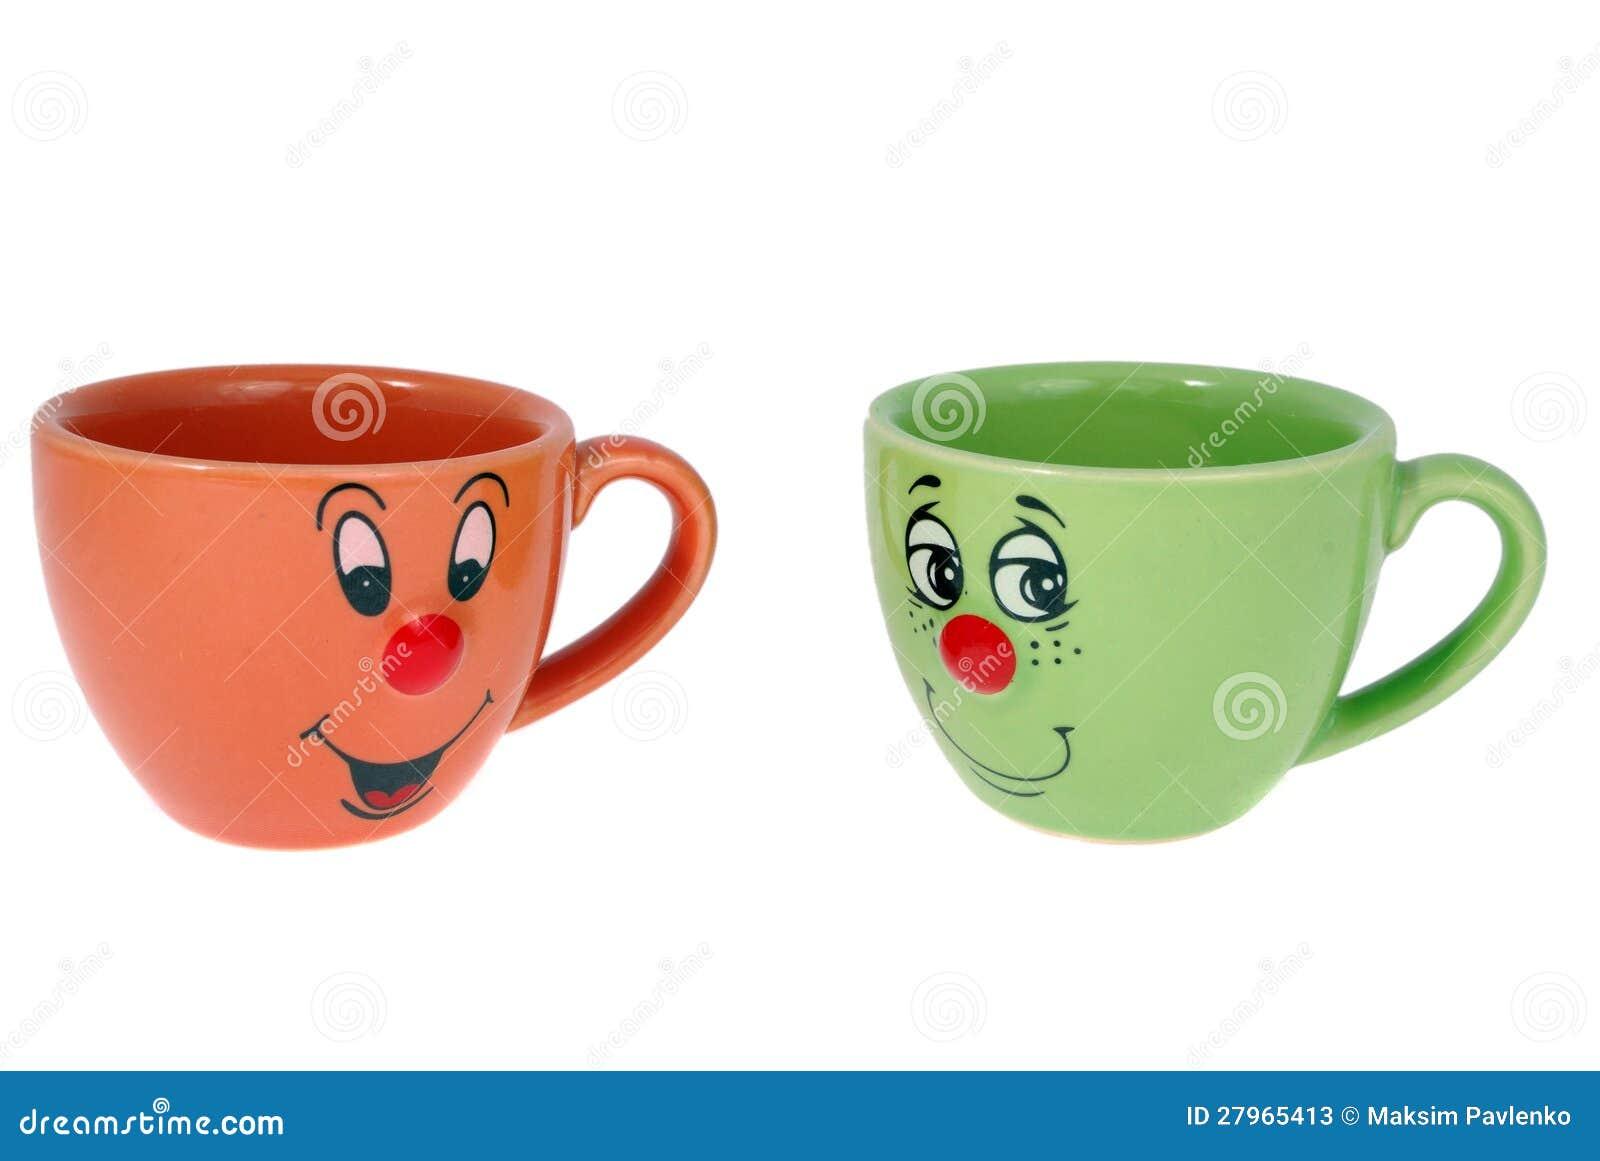 tea mugs and coffee cups stock photos image 27965413